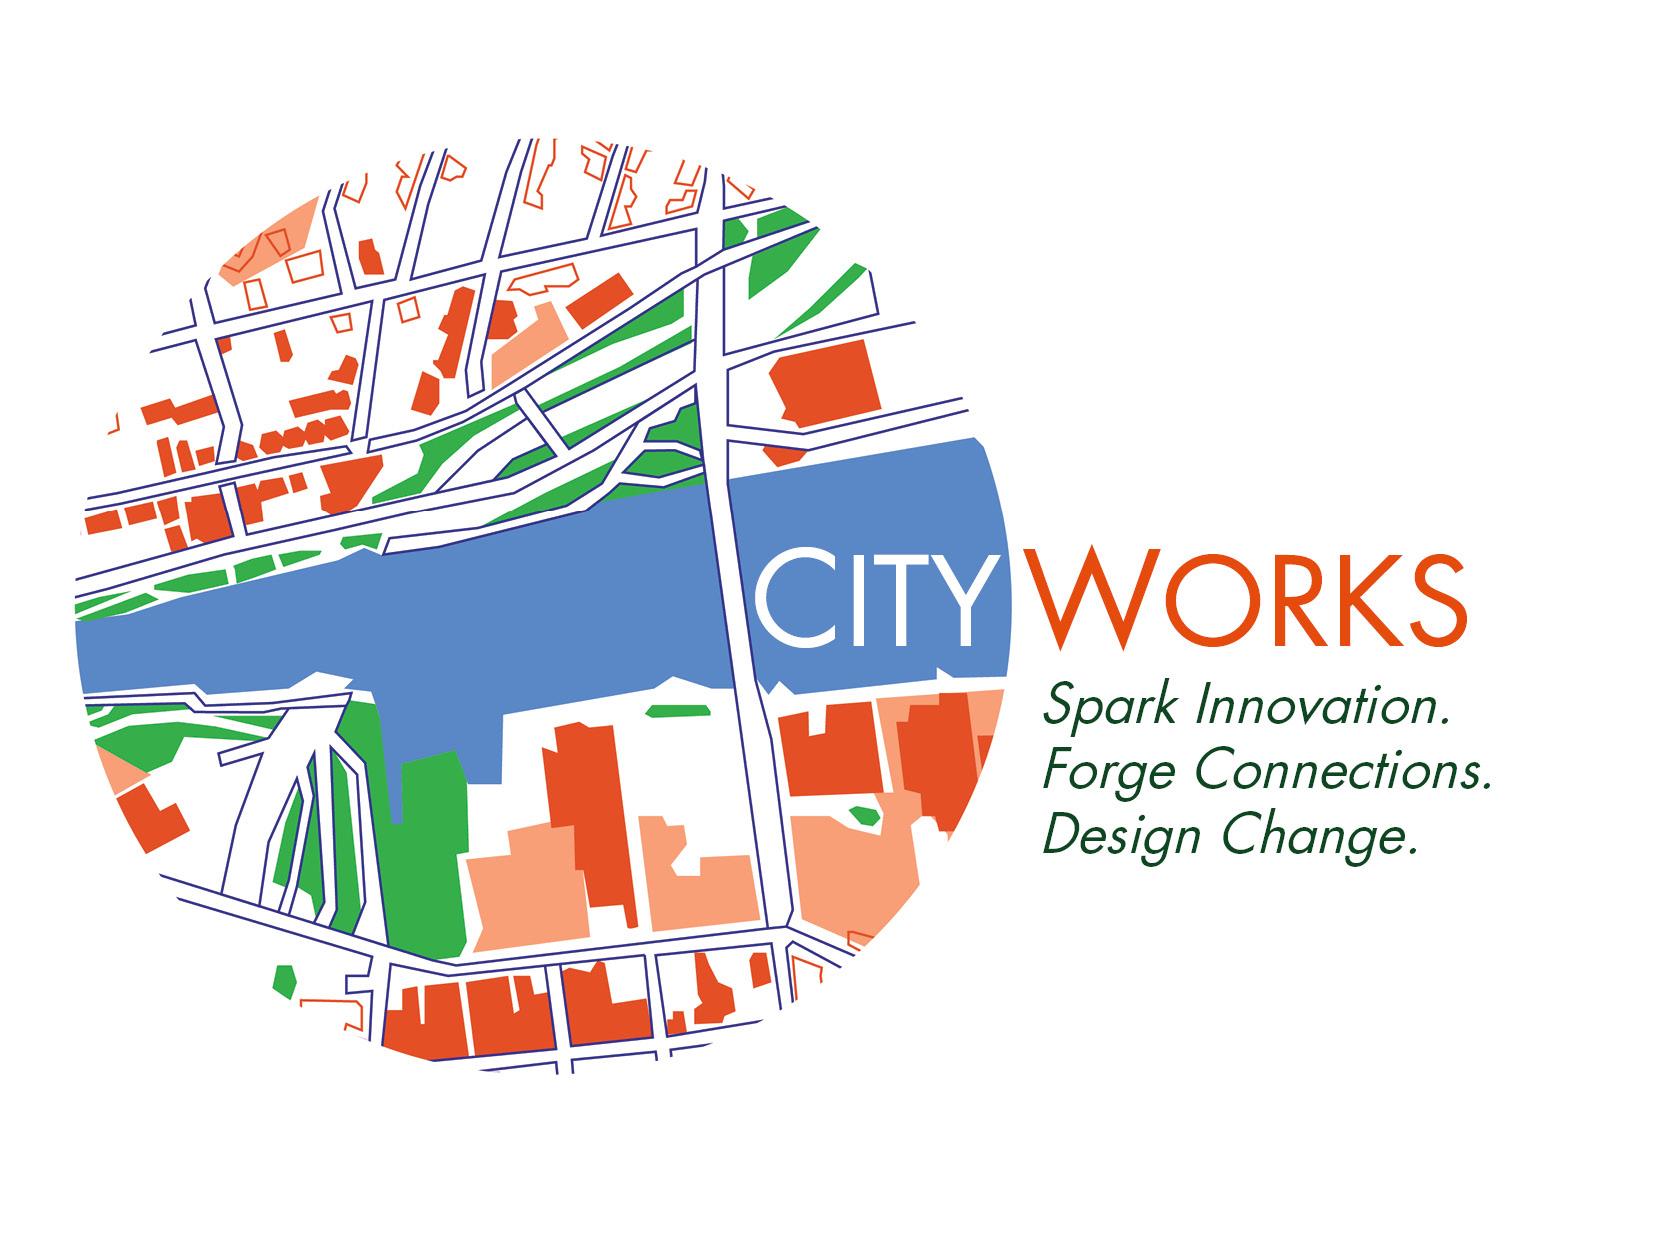 CityWorks_PRESS_IconText - Adrienne Gagnon.jpg